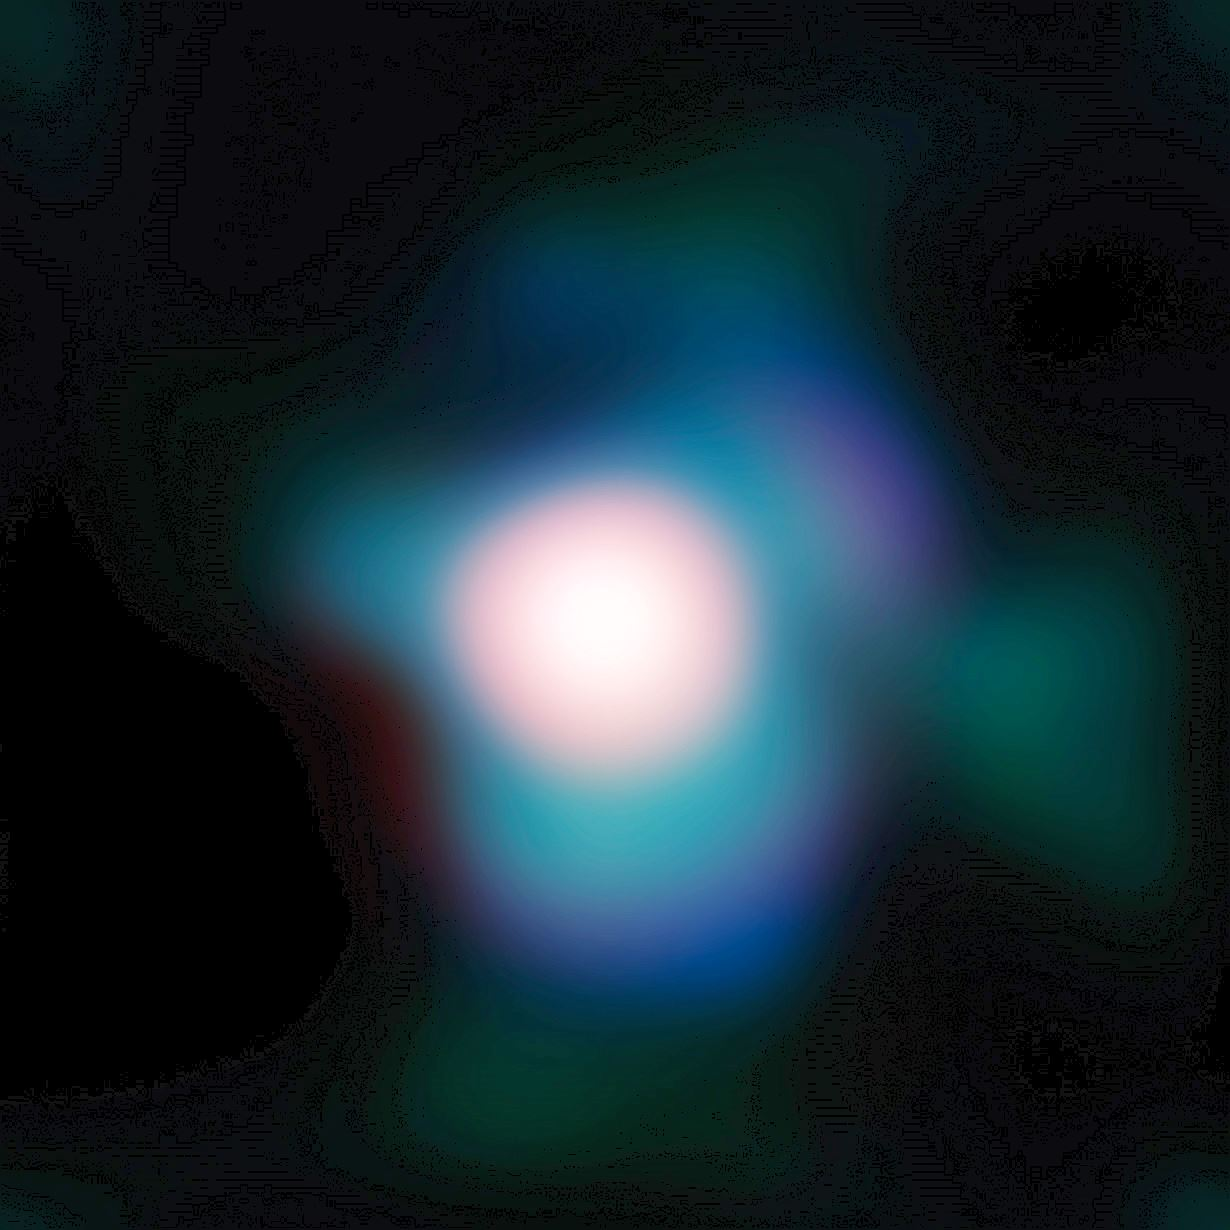 ESO VLT-Teleskop in Chile - Betelgeuze